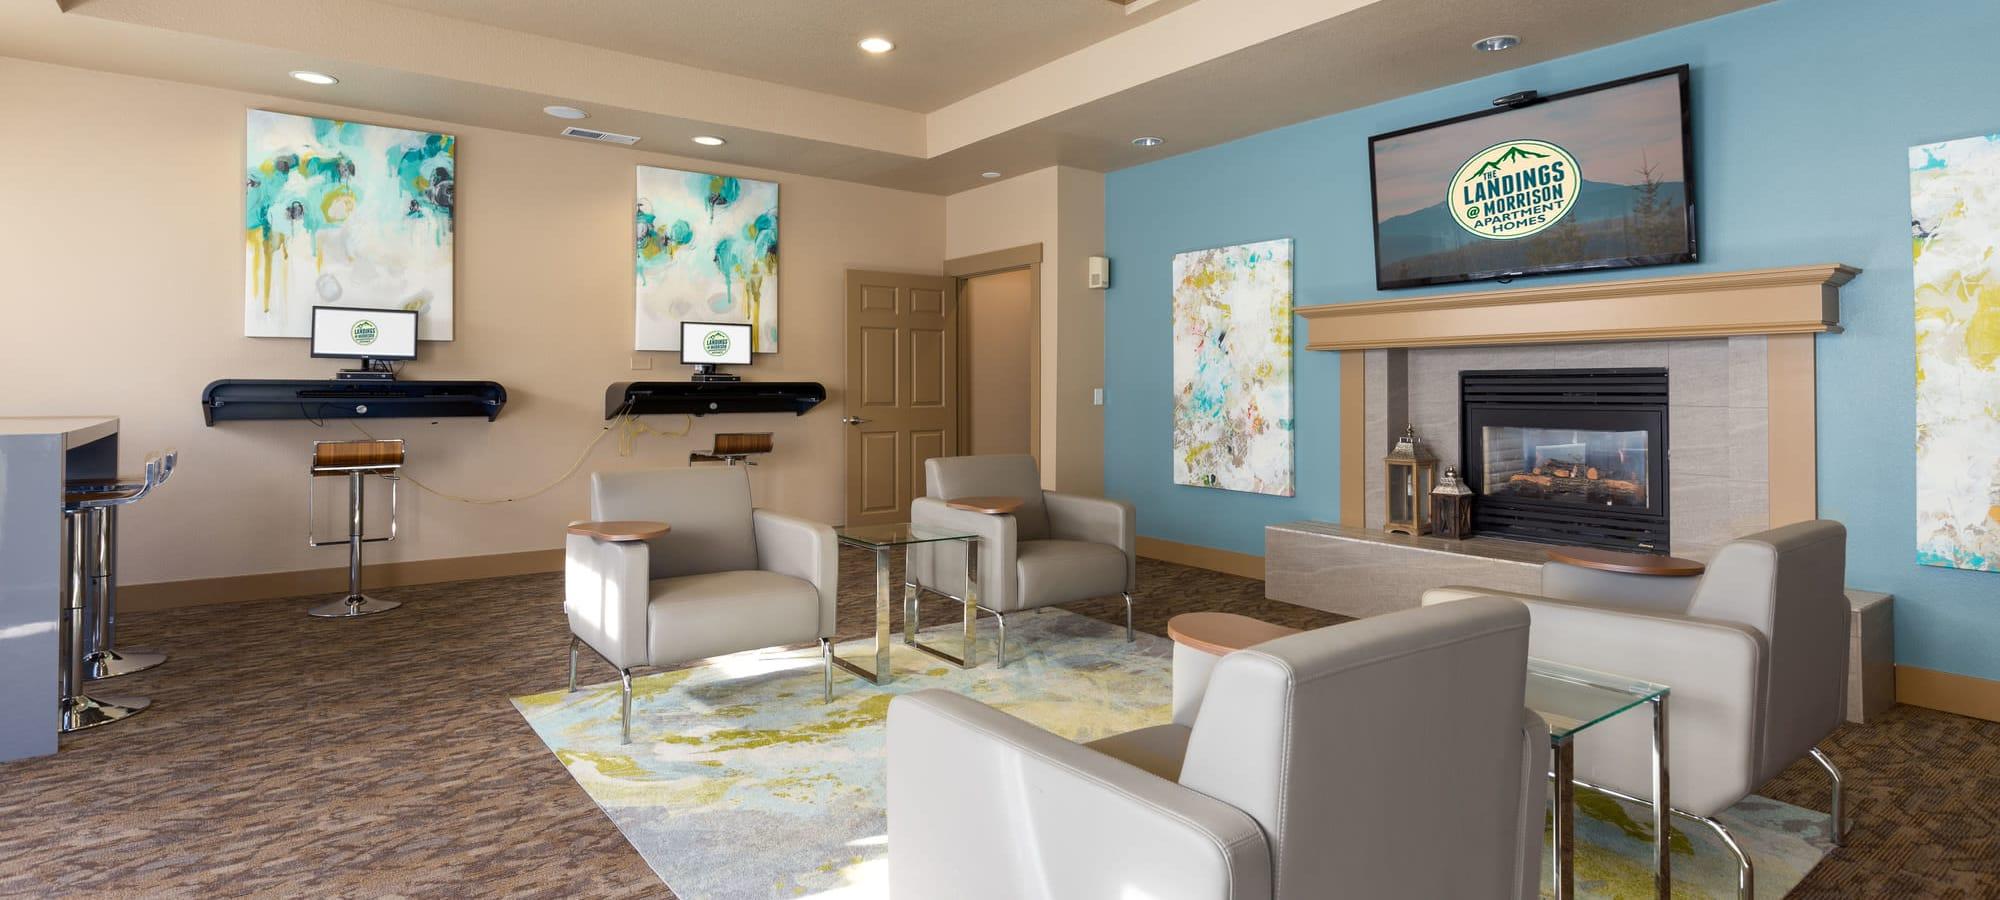 Gresham, Oregon apartments at The Landings at Morrison Apartments